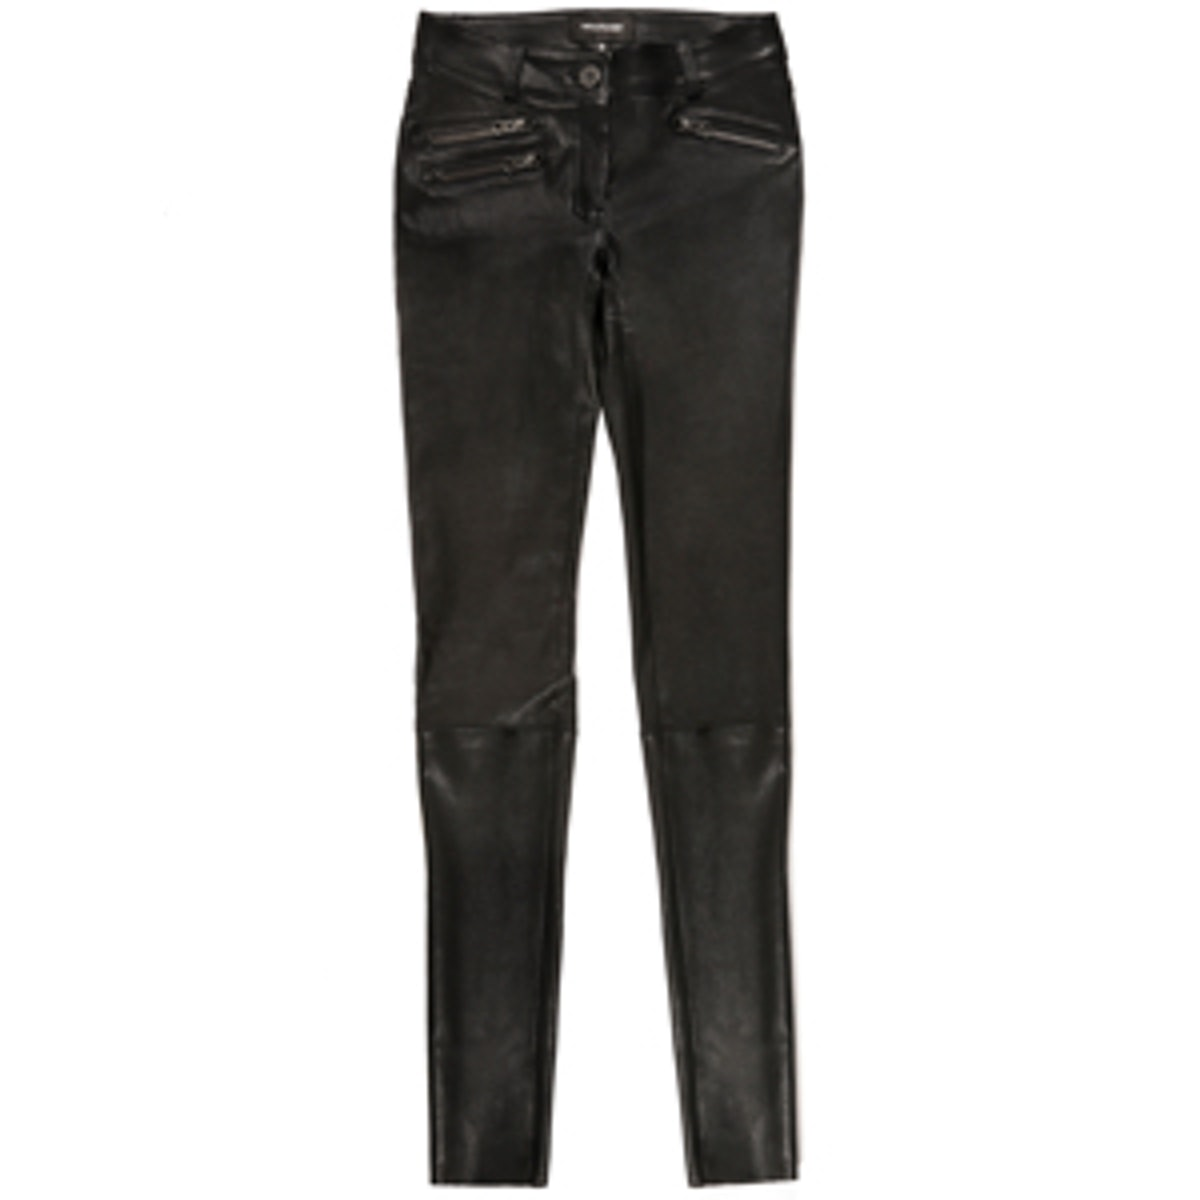 Miki-S4 Black Leather Pants